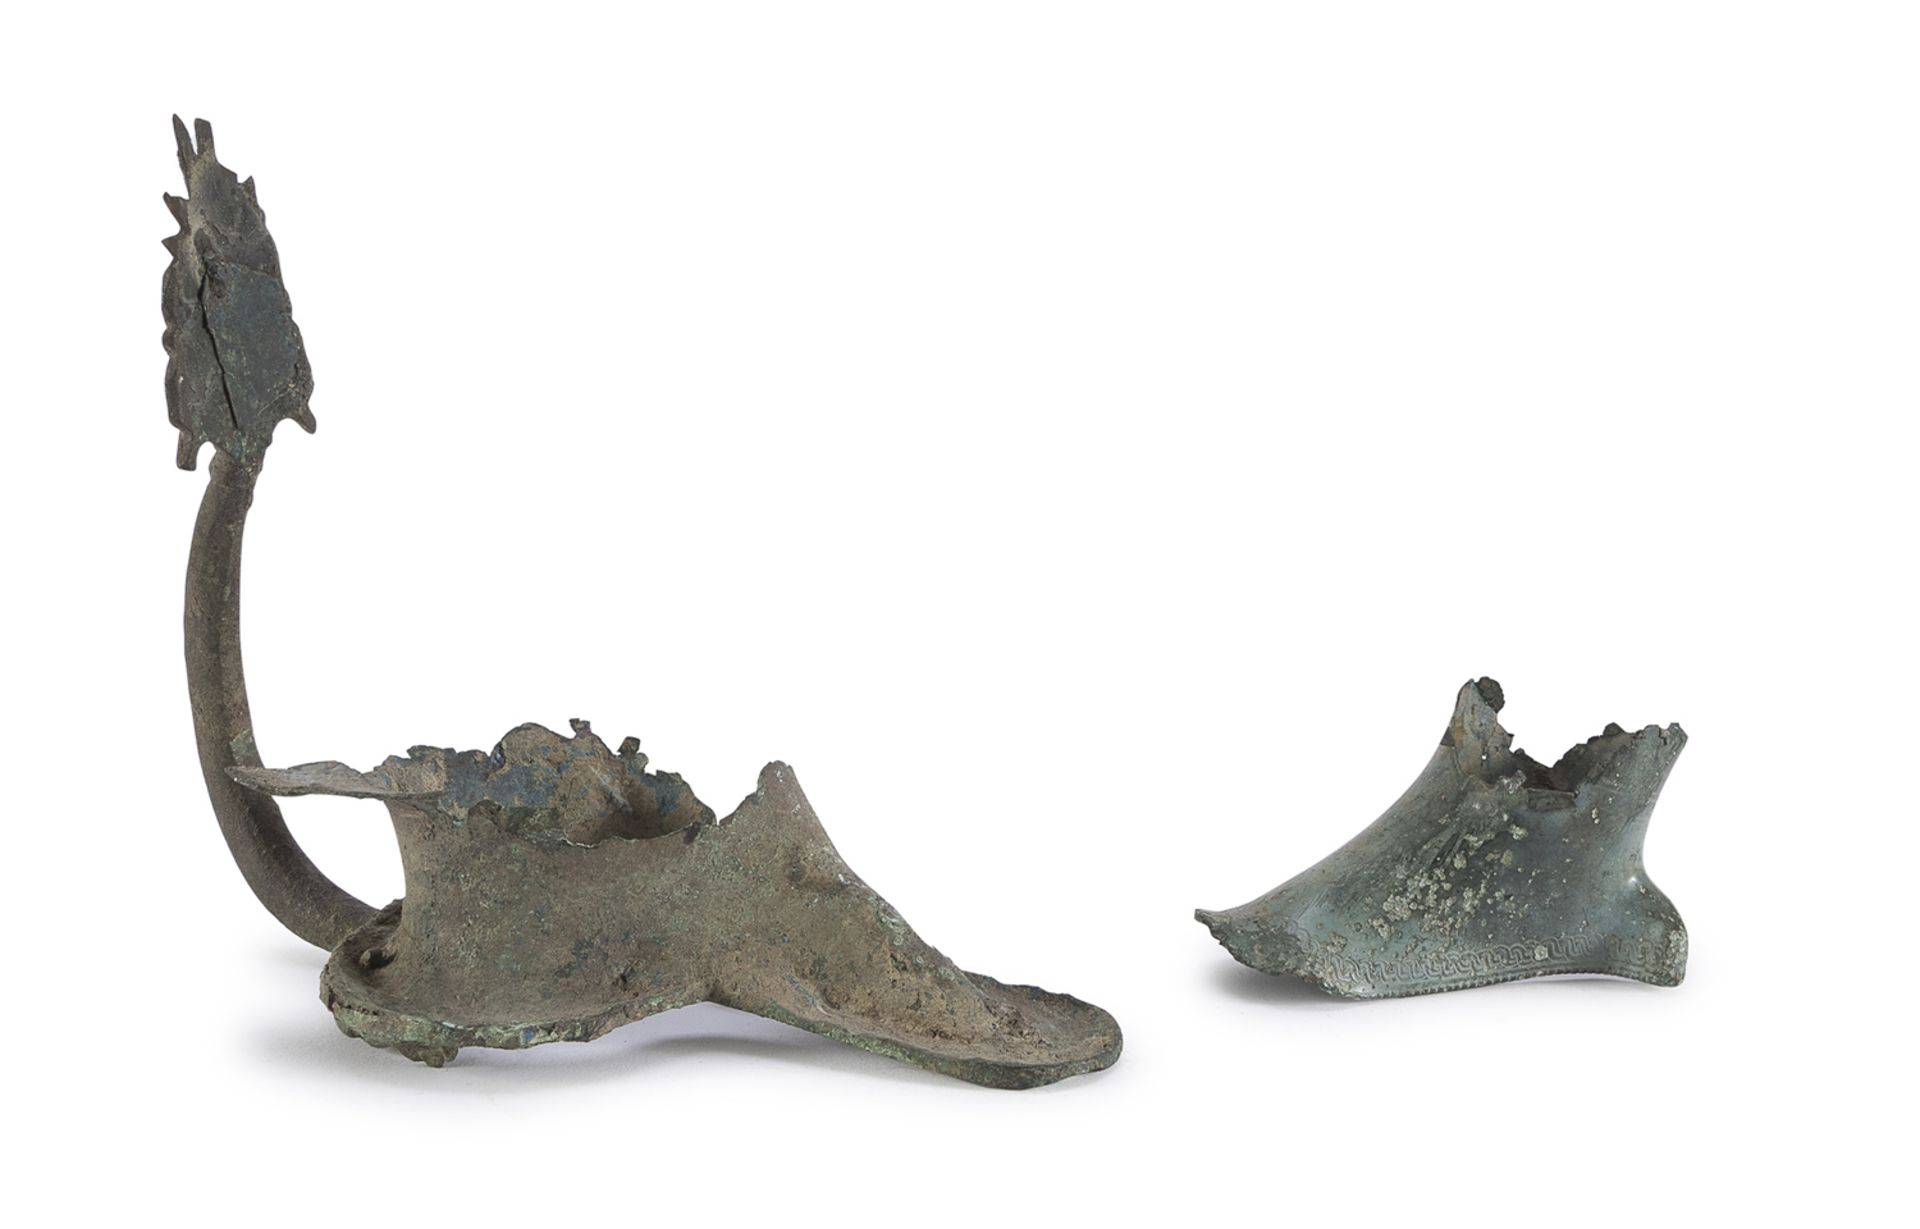 BRONZE HANDLE 4th-1st CENTURY BC